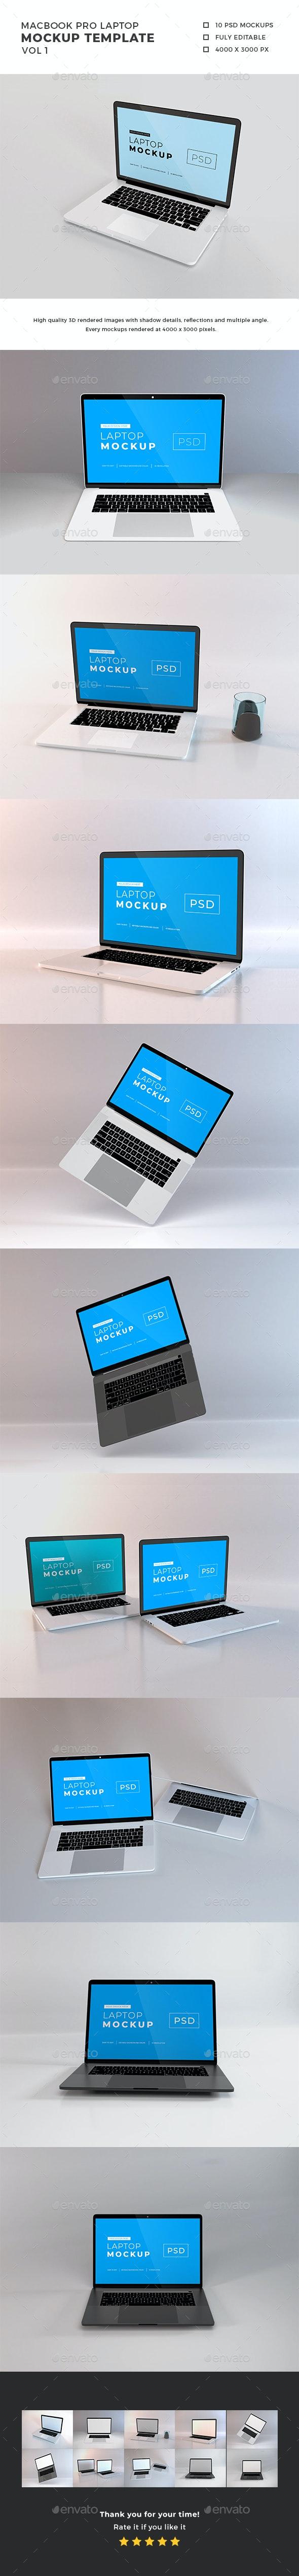 Macbook Pro Laptop Mockup Vol 1 - Laptop Displays